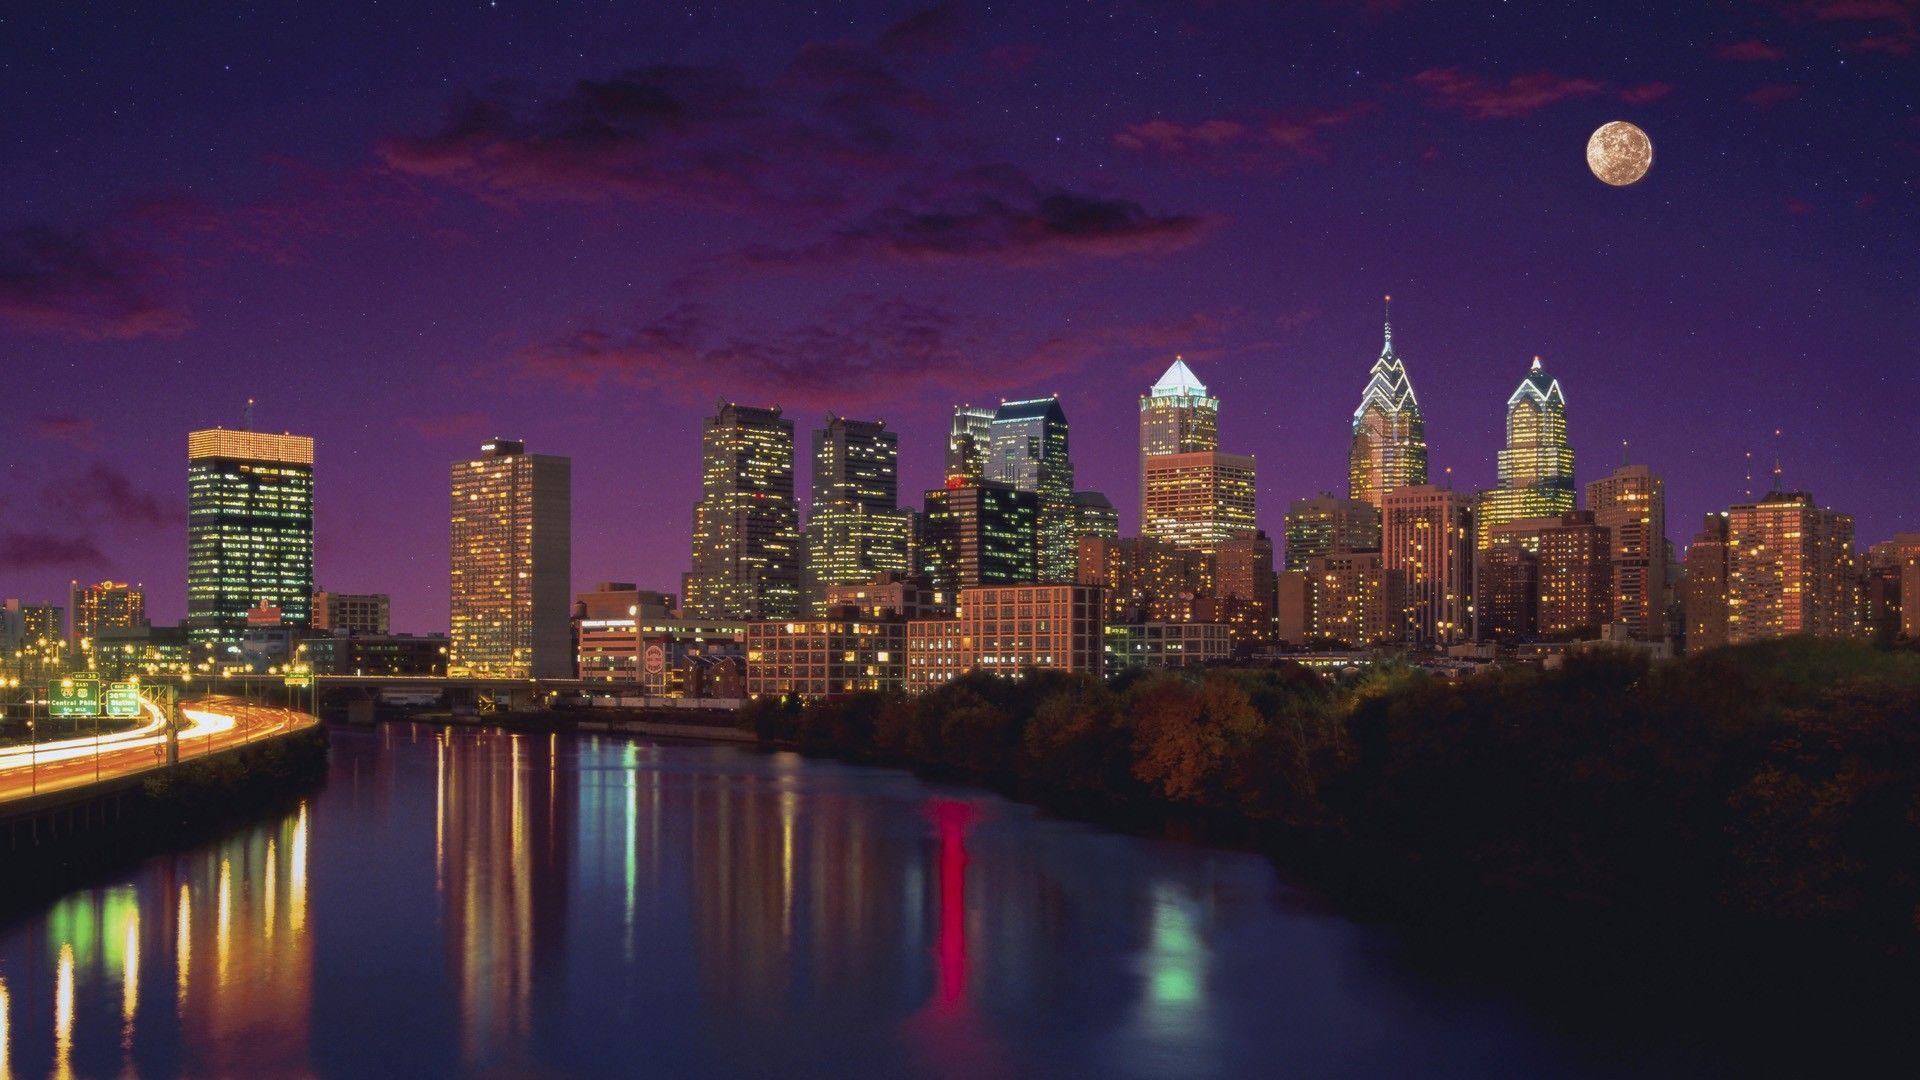 Philadelphia hd wallpaper